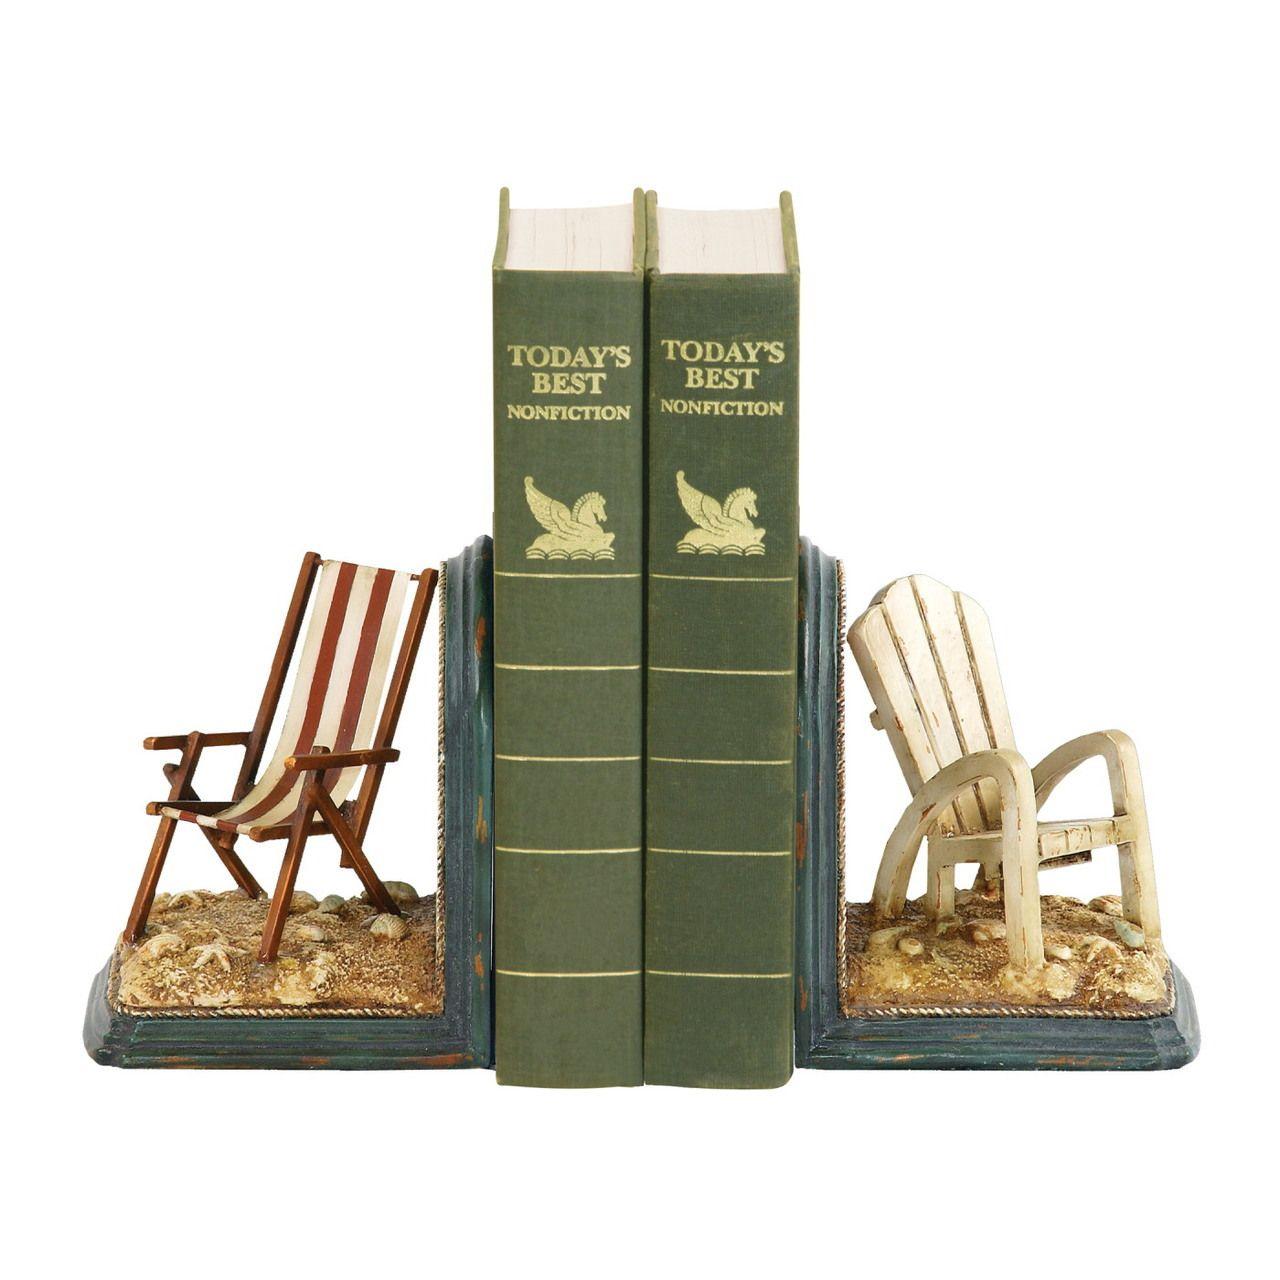 Beach Chair Bookends - cute idea for beach cottage bookshelf